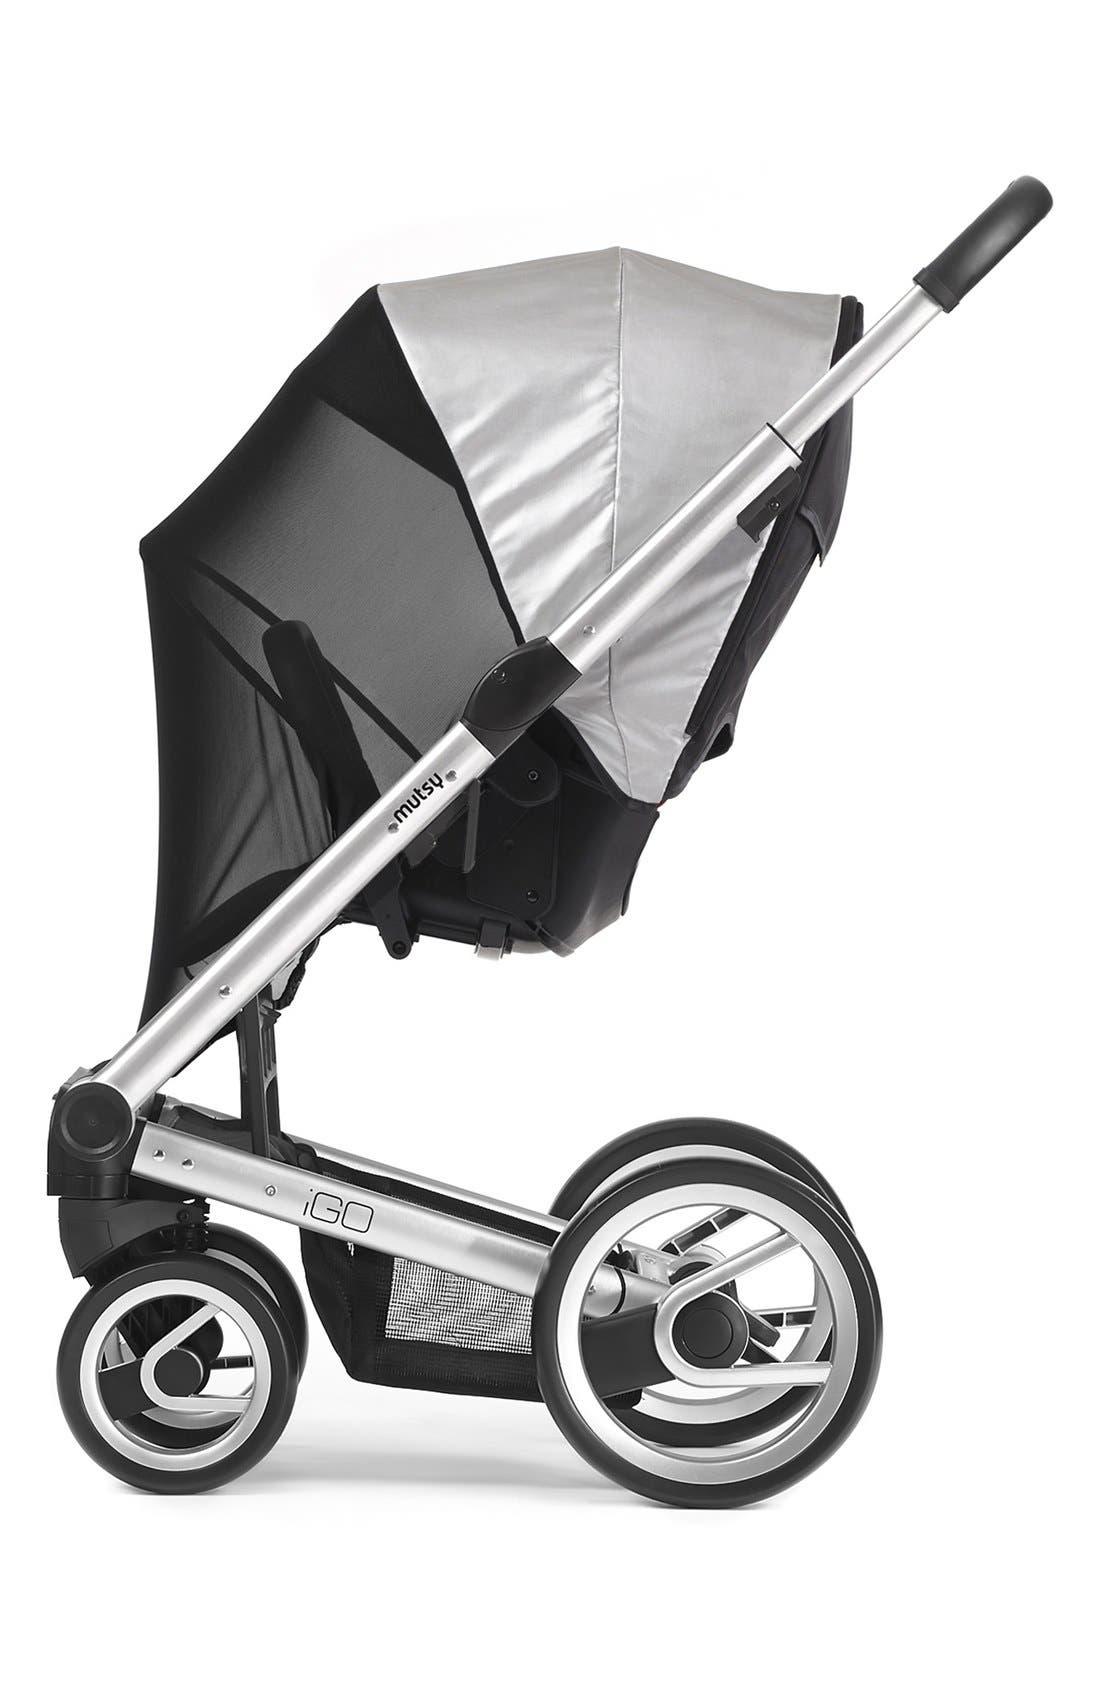 Main Image - Mutsy 'Igo' Stroller Seat UV Cover